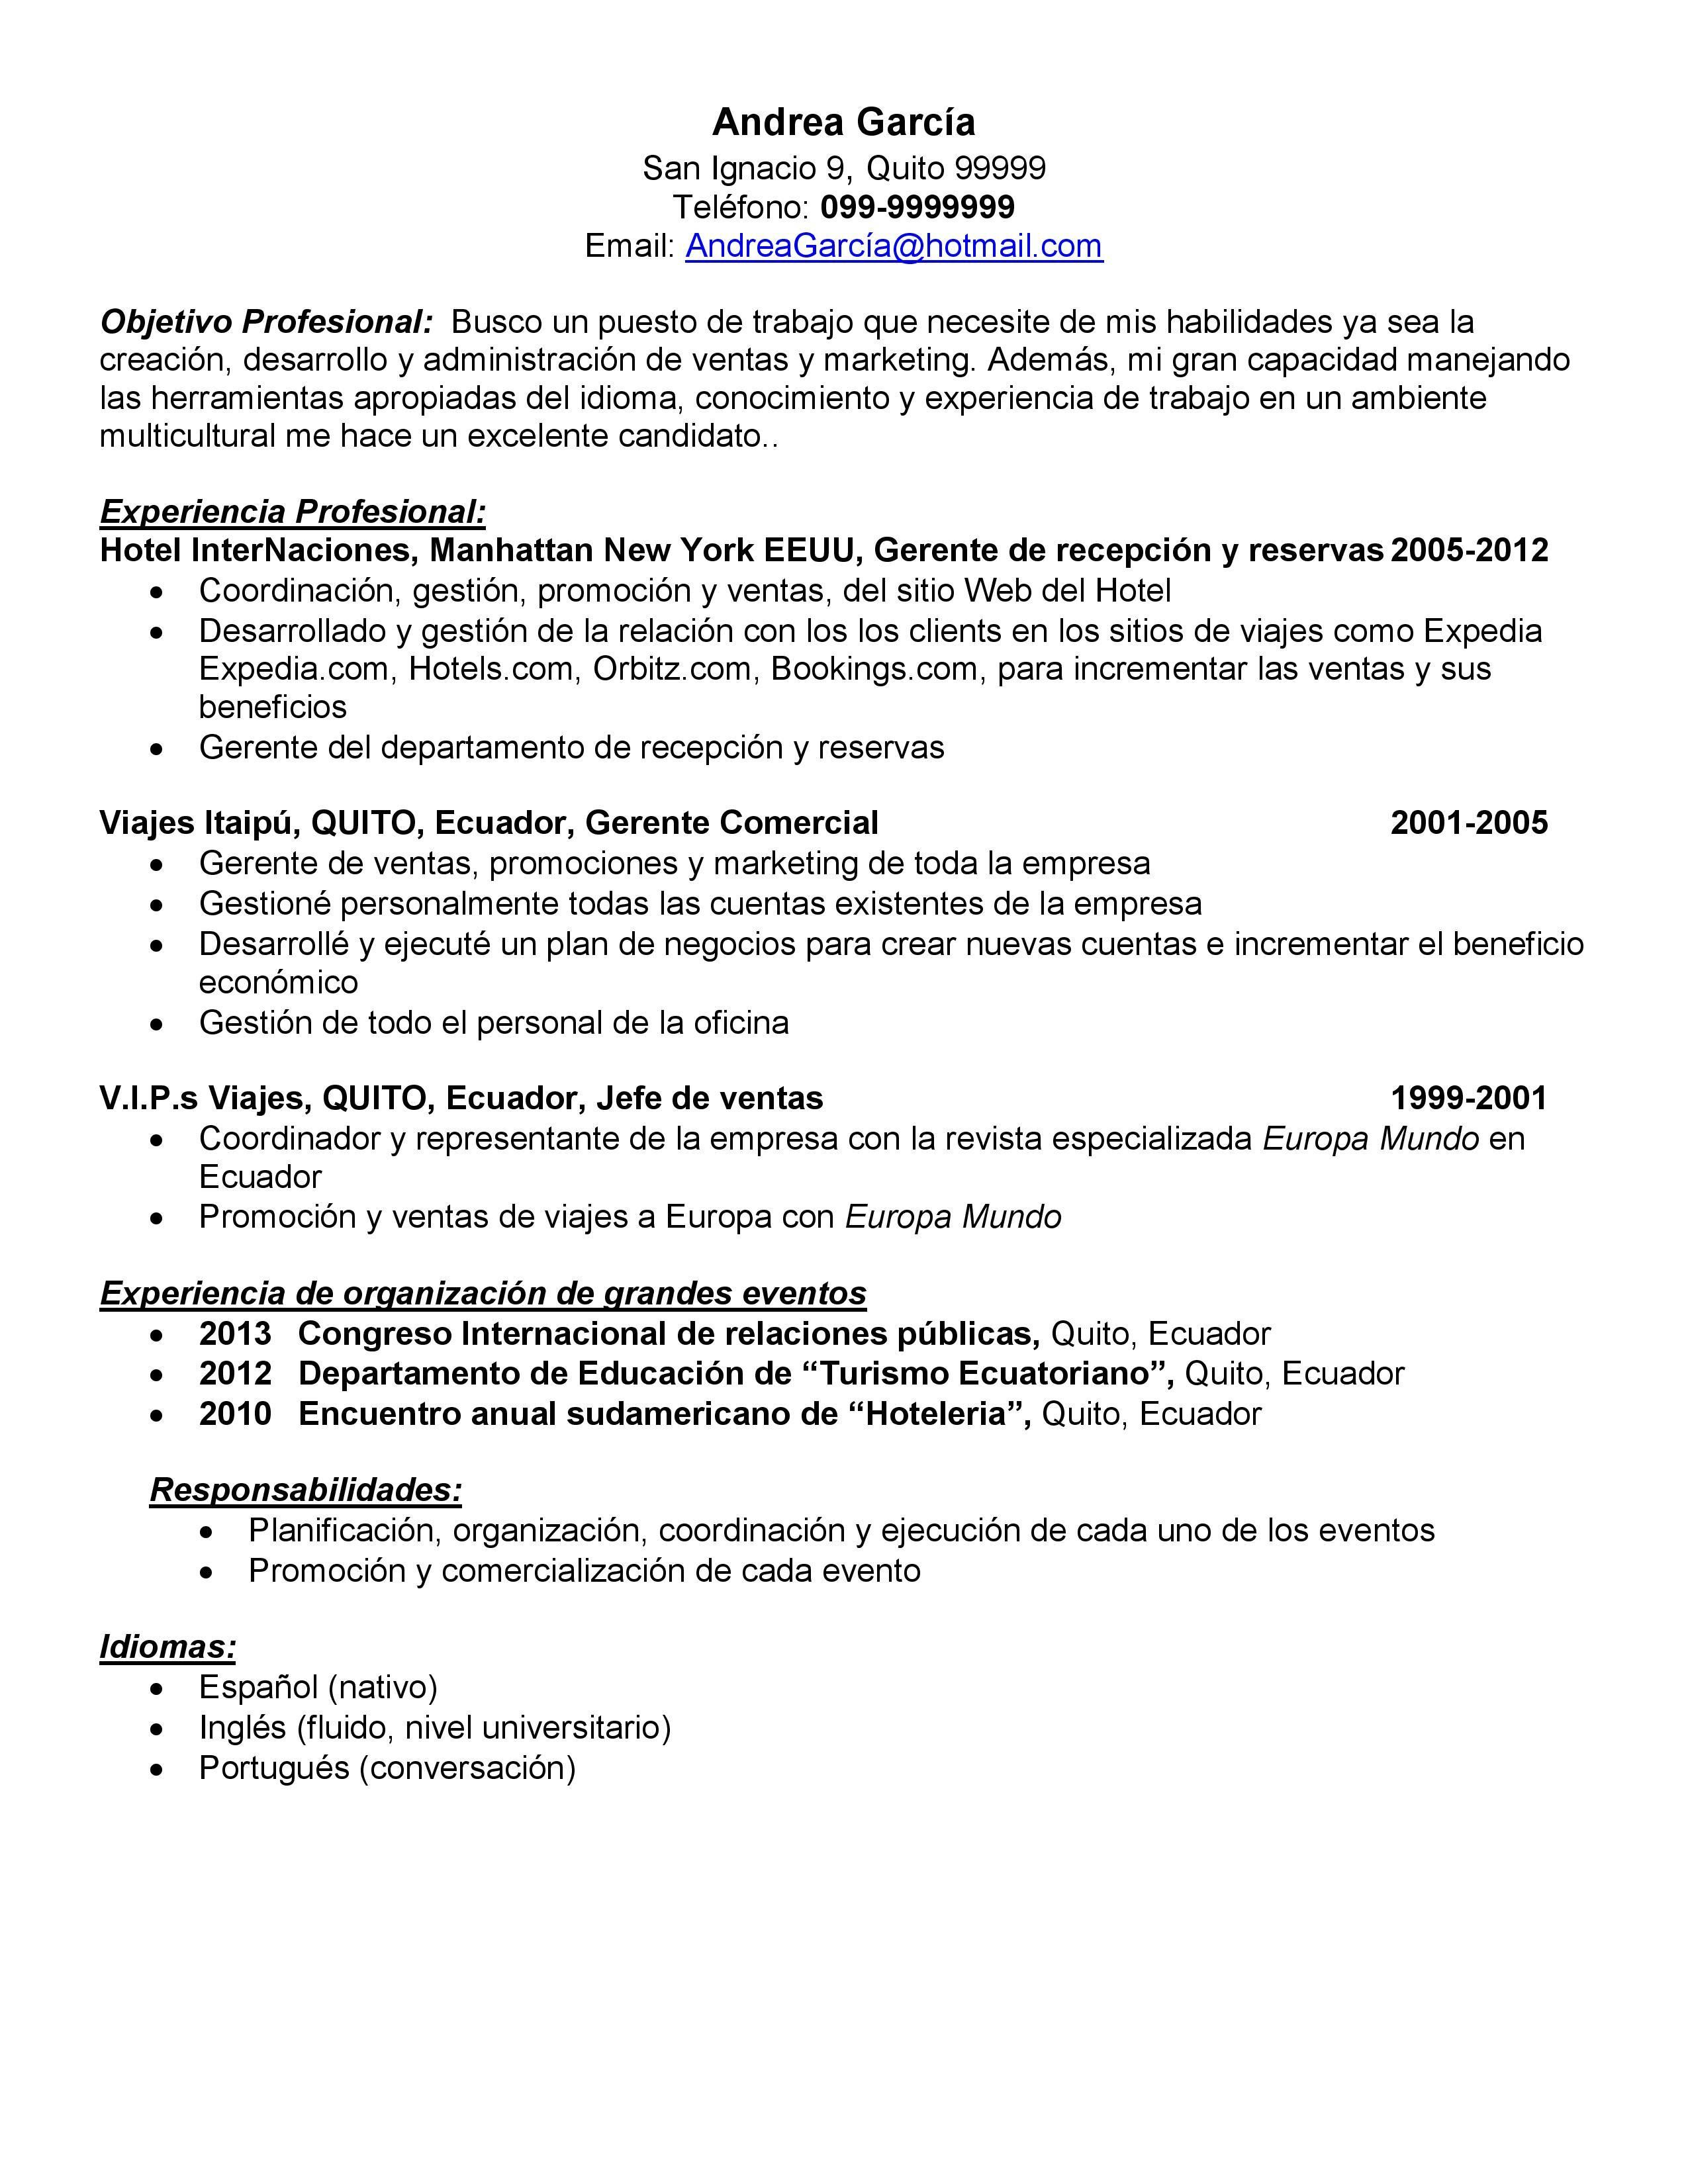 Demo De Curriculum Vitae Para Promotor De Ventas Cv